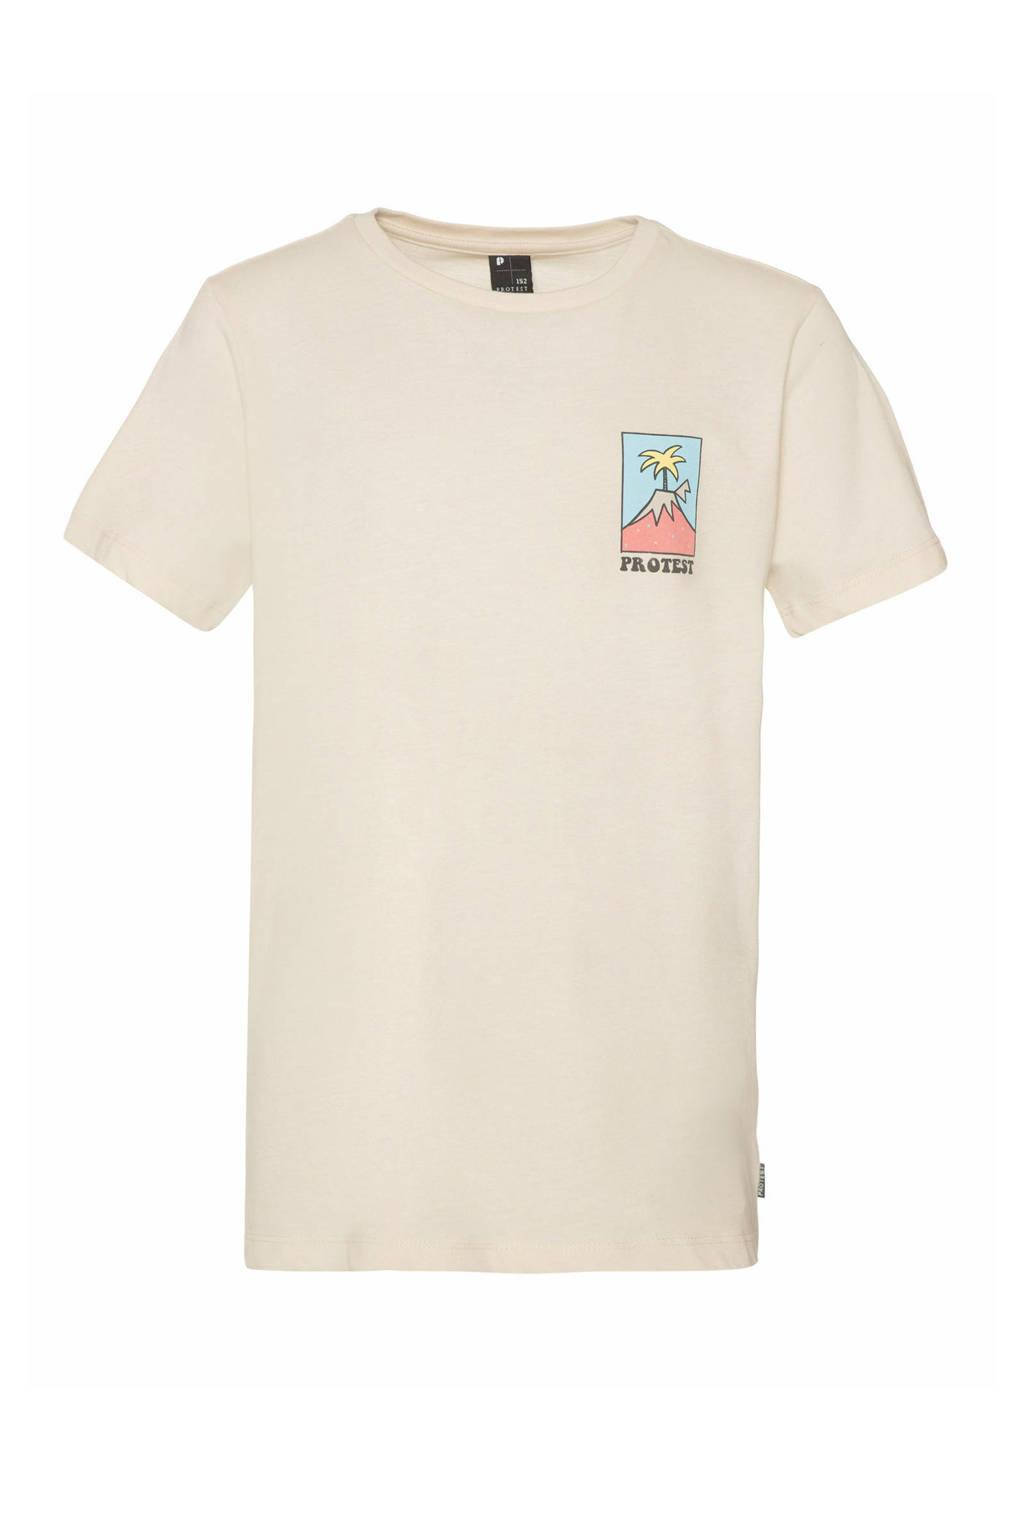 Protest T-shirt Blaze off-white, Kit